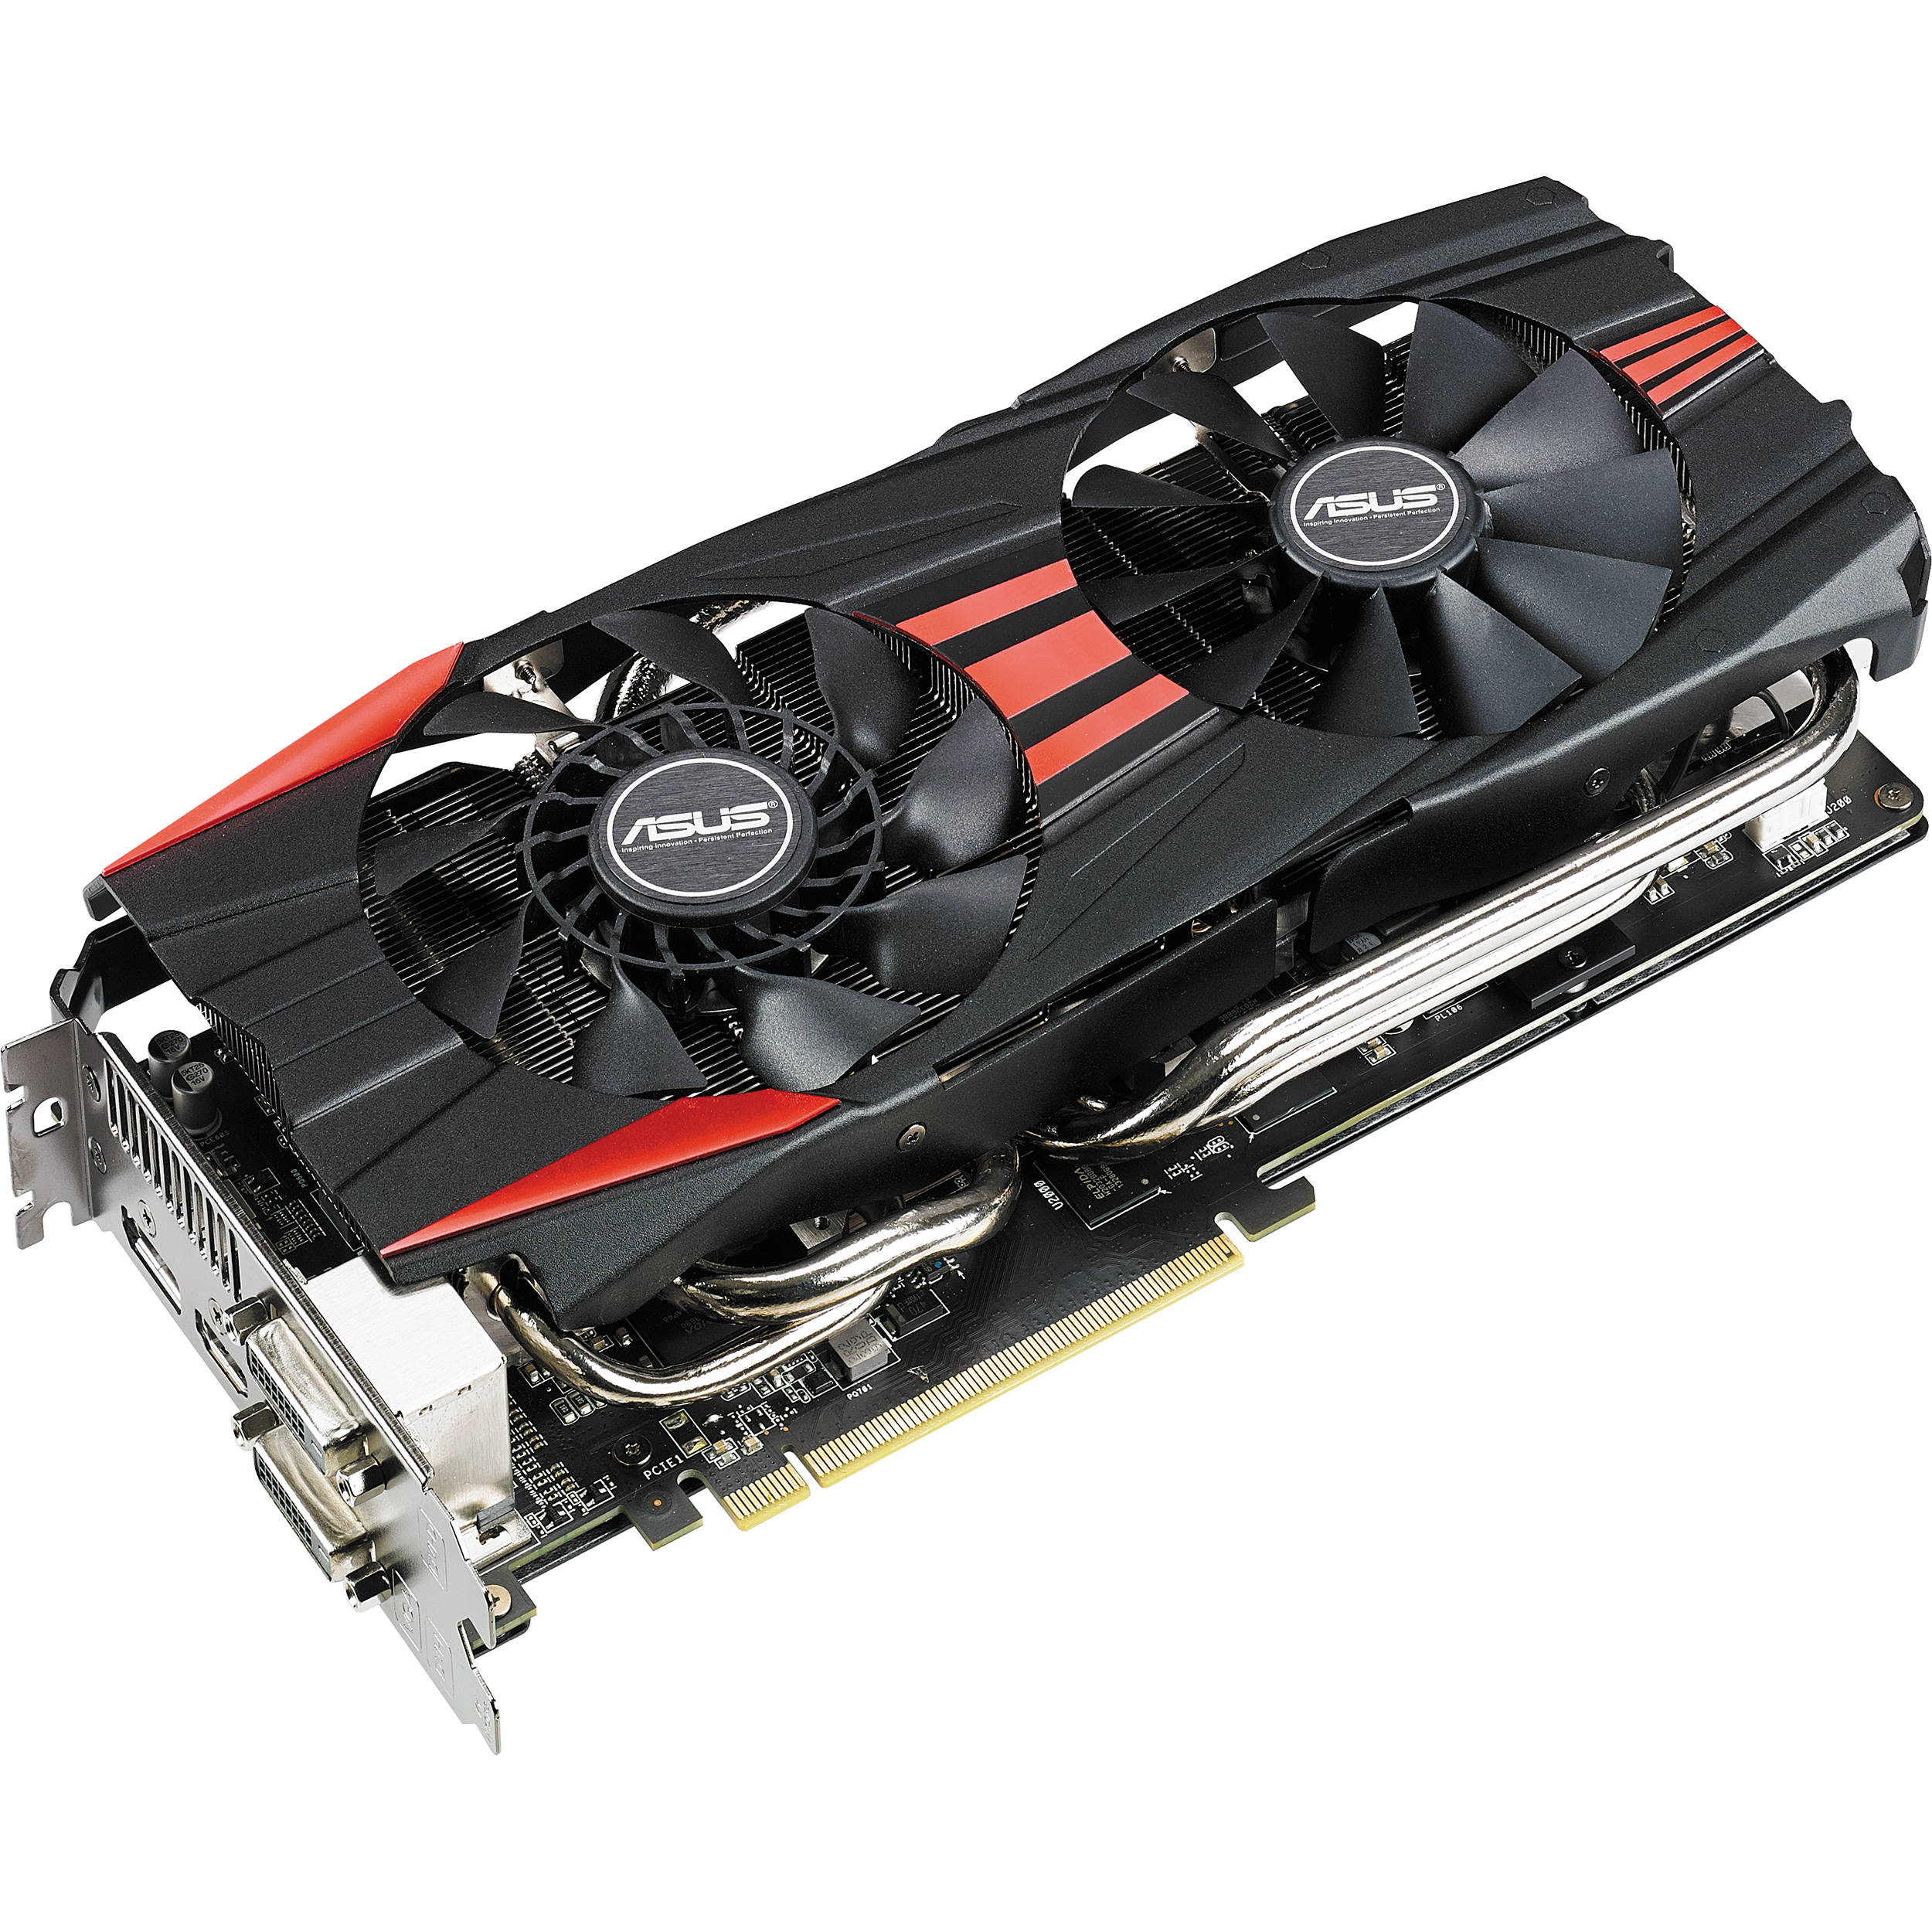 ASUS Radeon R9 290 Graphics Card